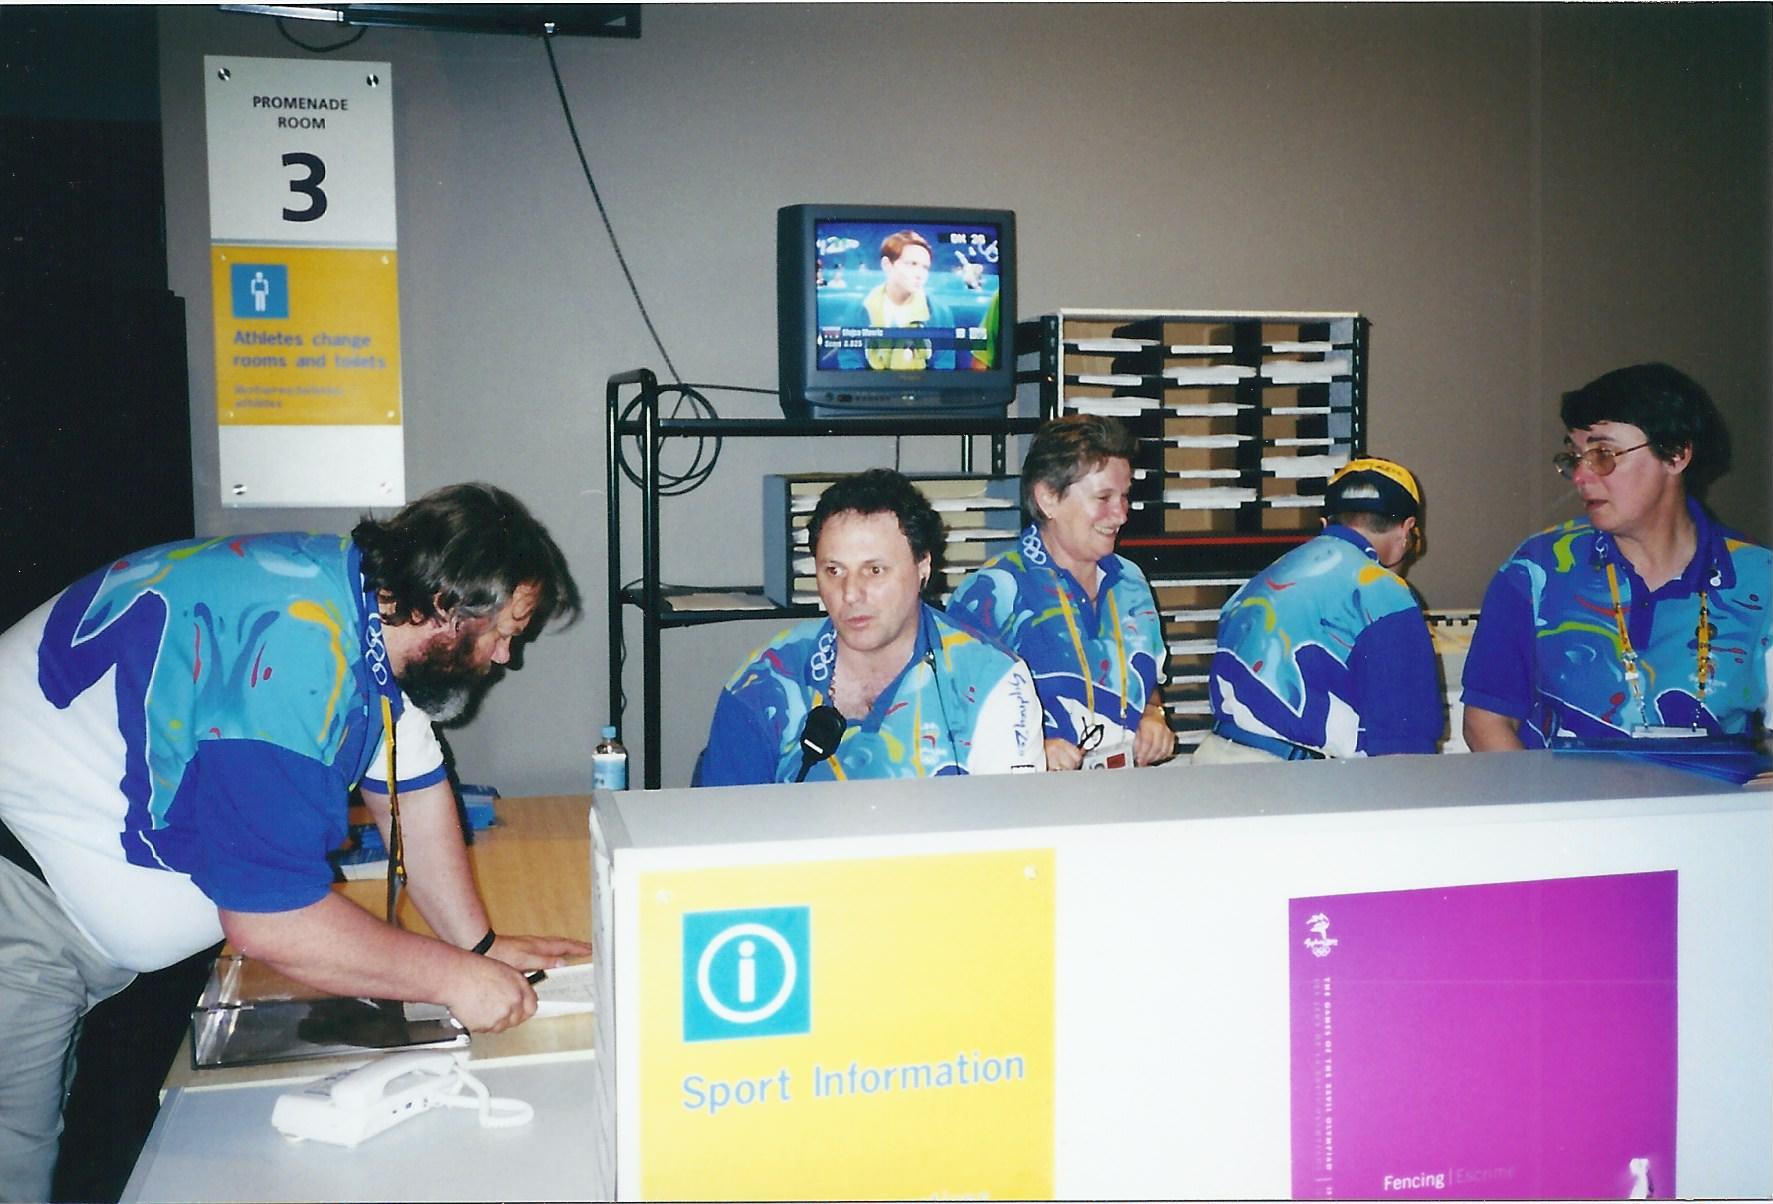 Sydney 2000 Olympics fencing sport information desk